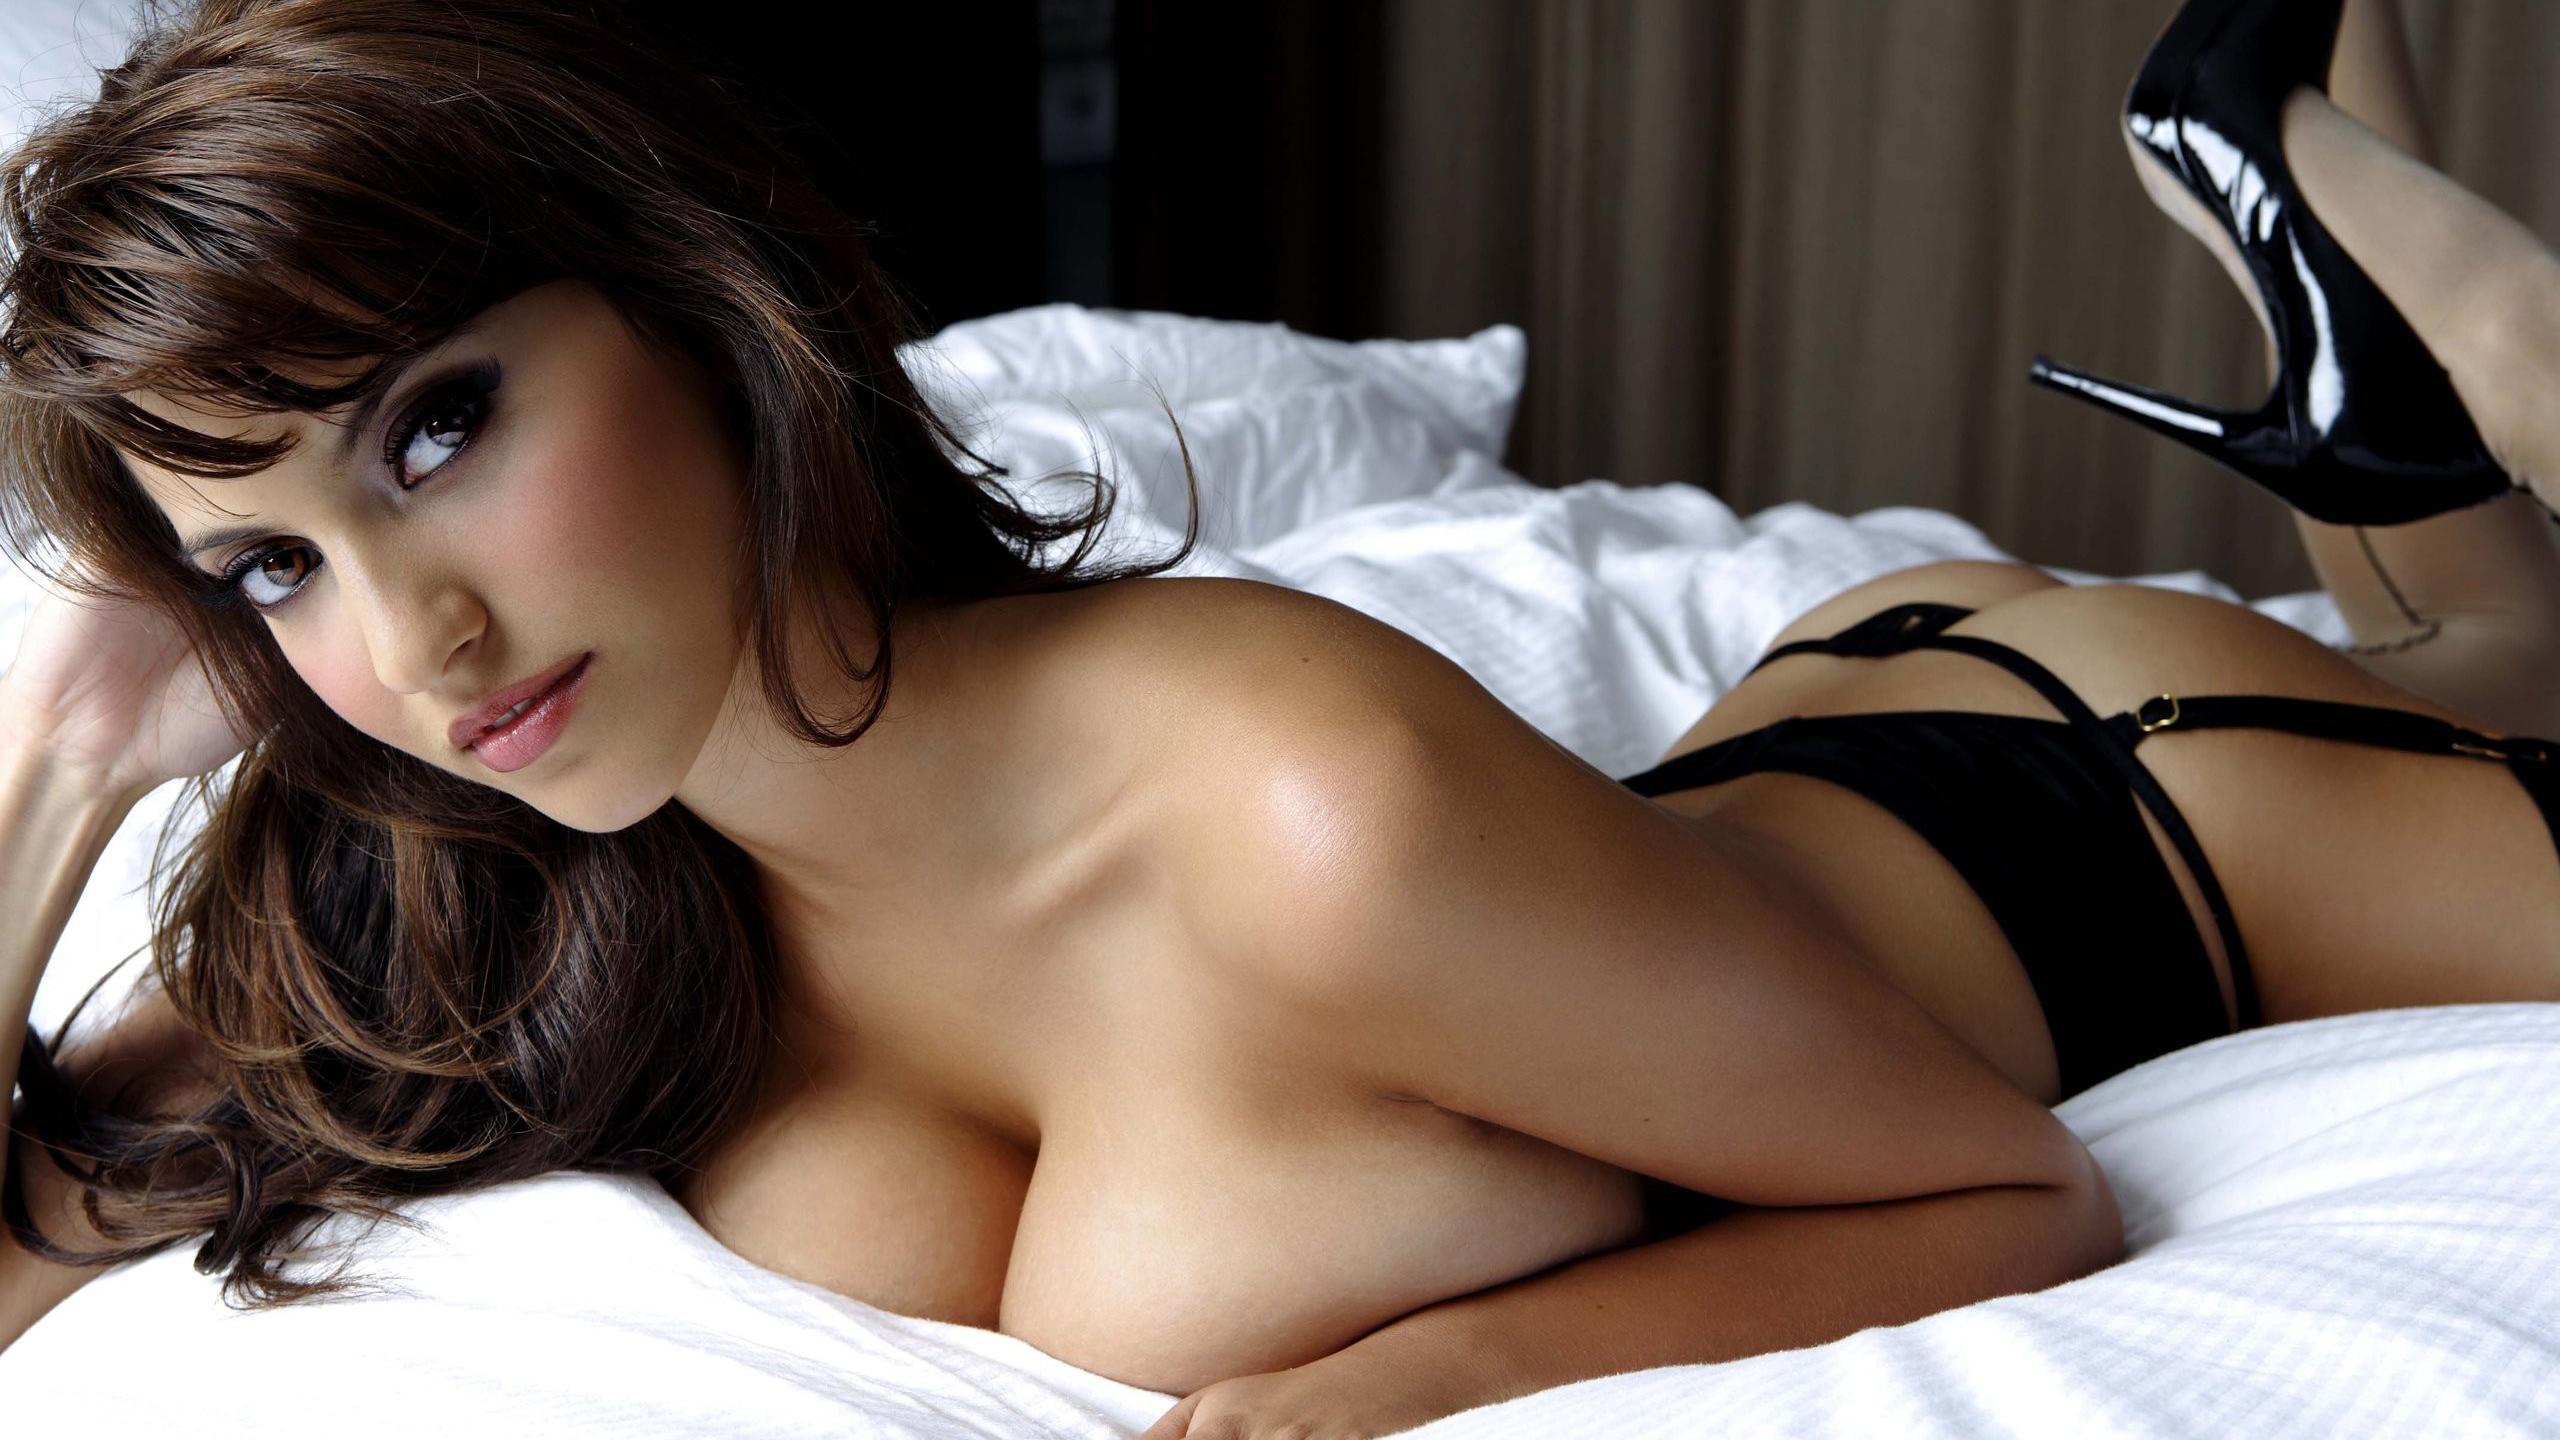 Hot sexsy gir playboy hd video wow erotic photos